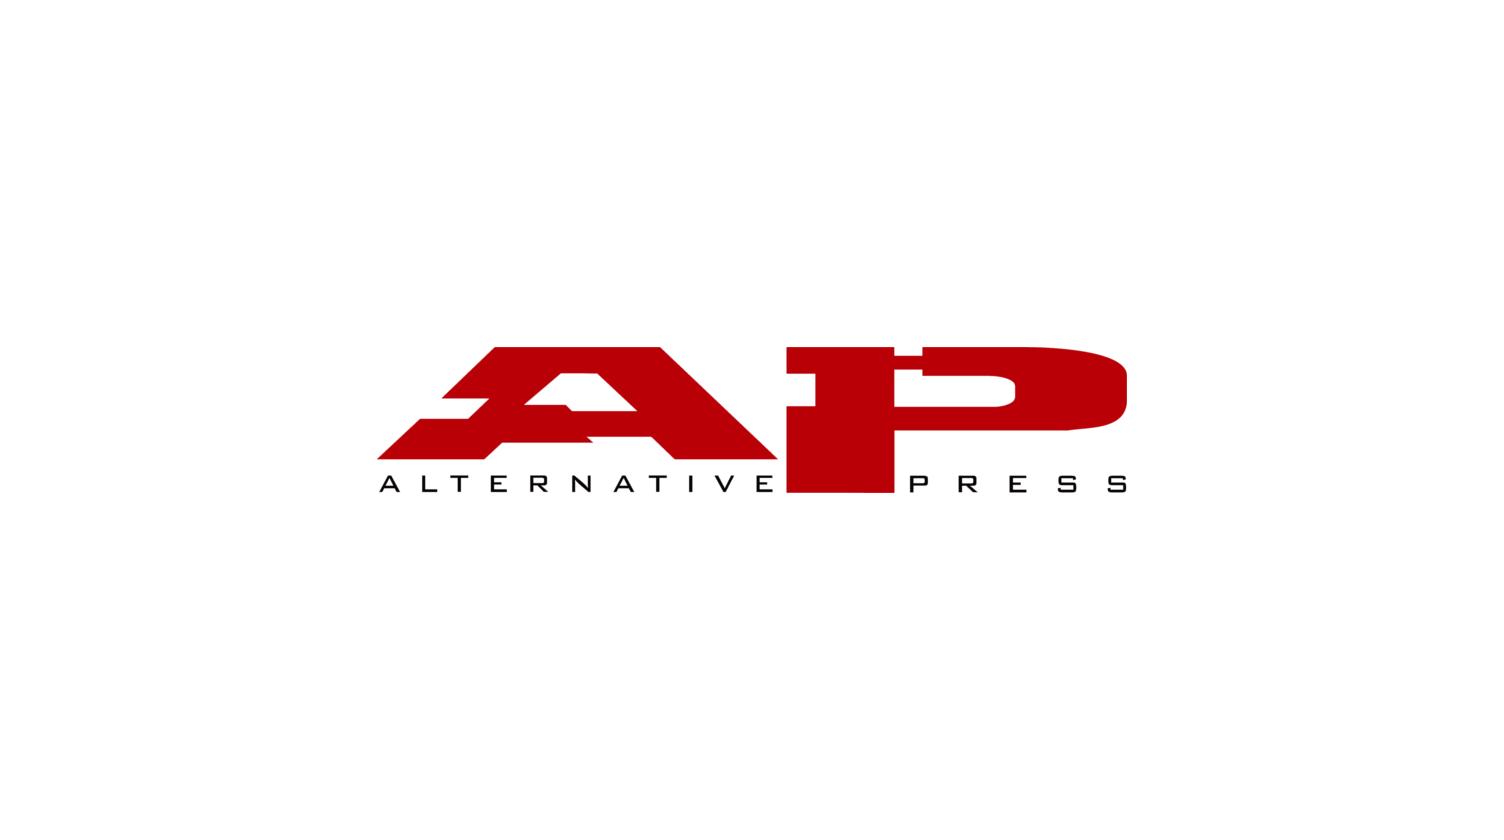 Alternative Press